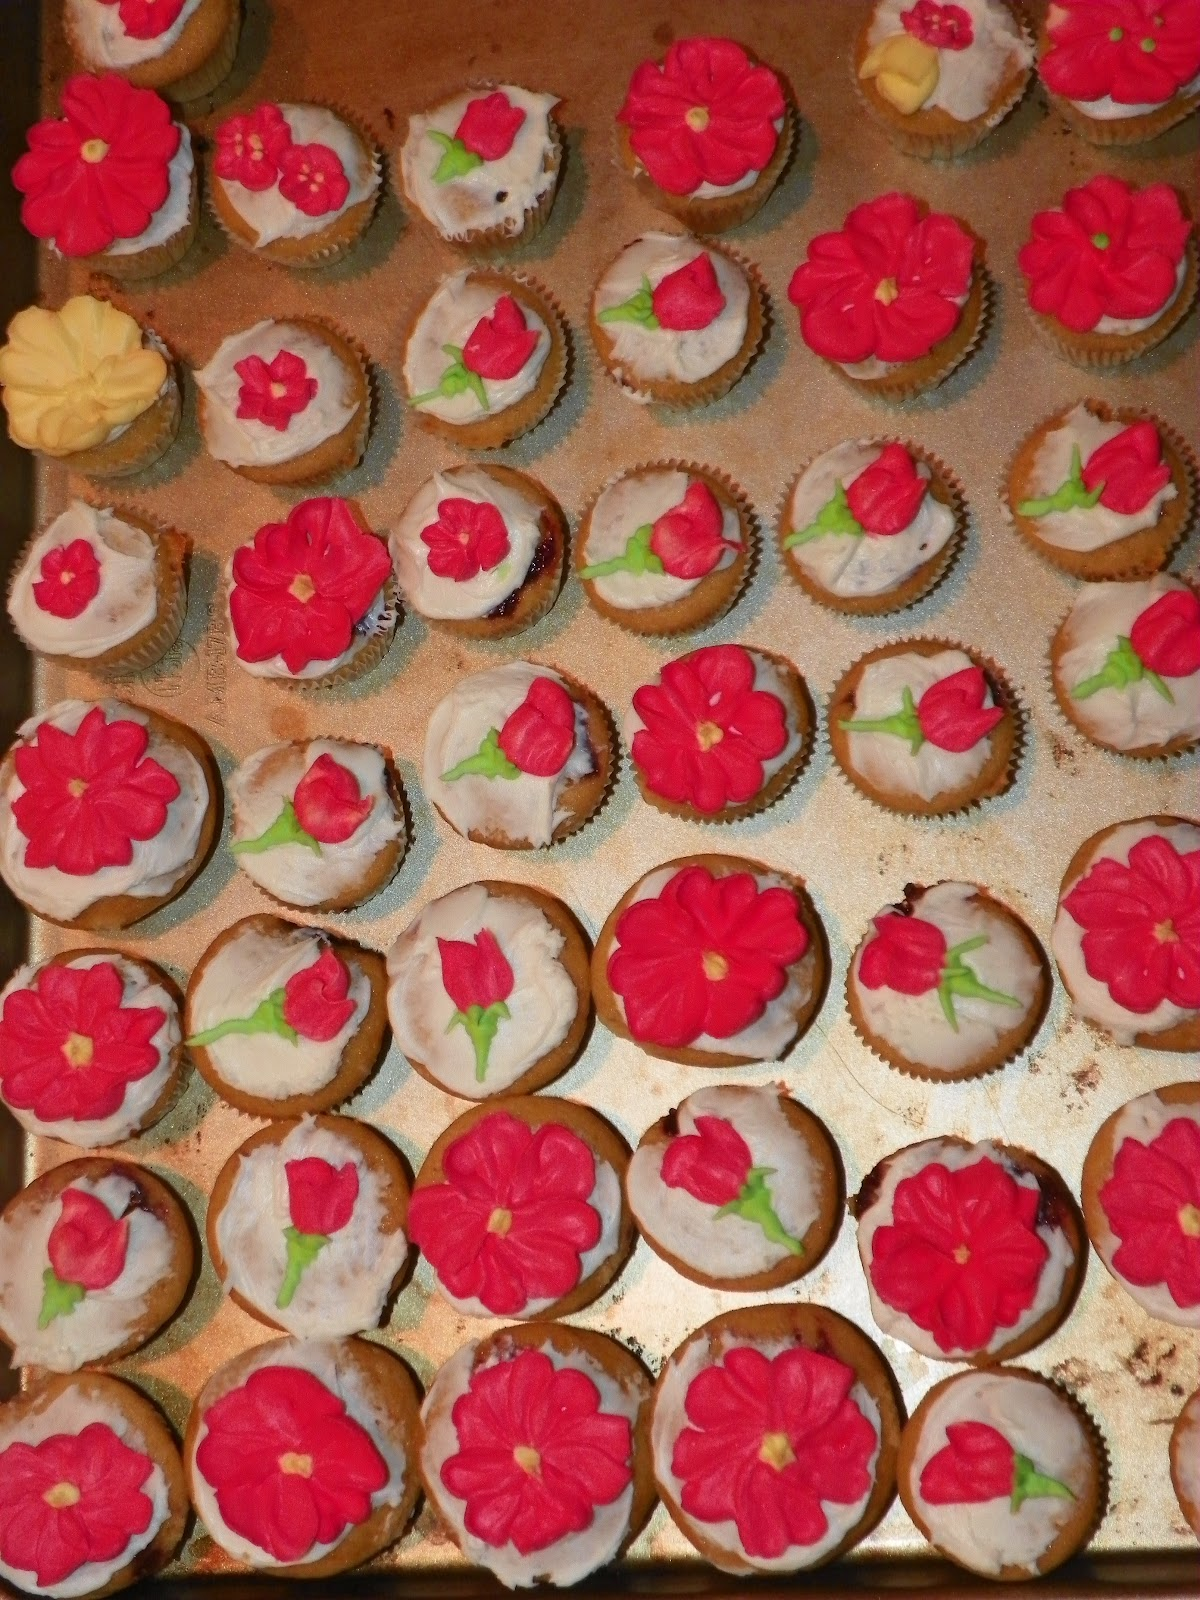 Joanns Fabric Cake Decorating Class